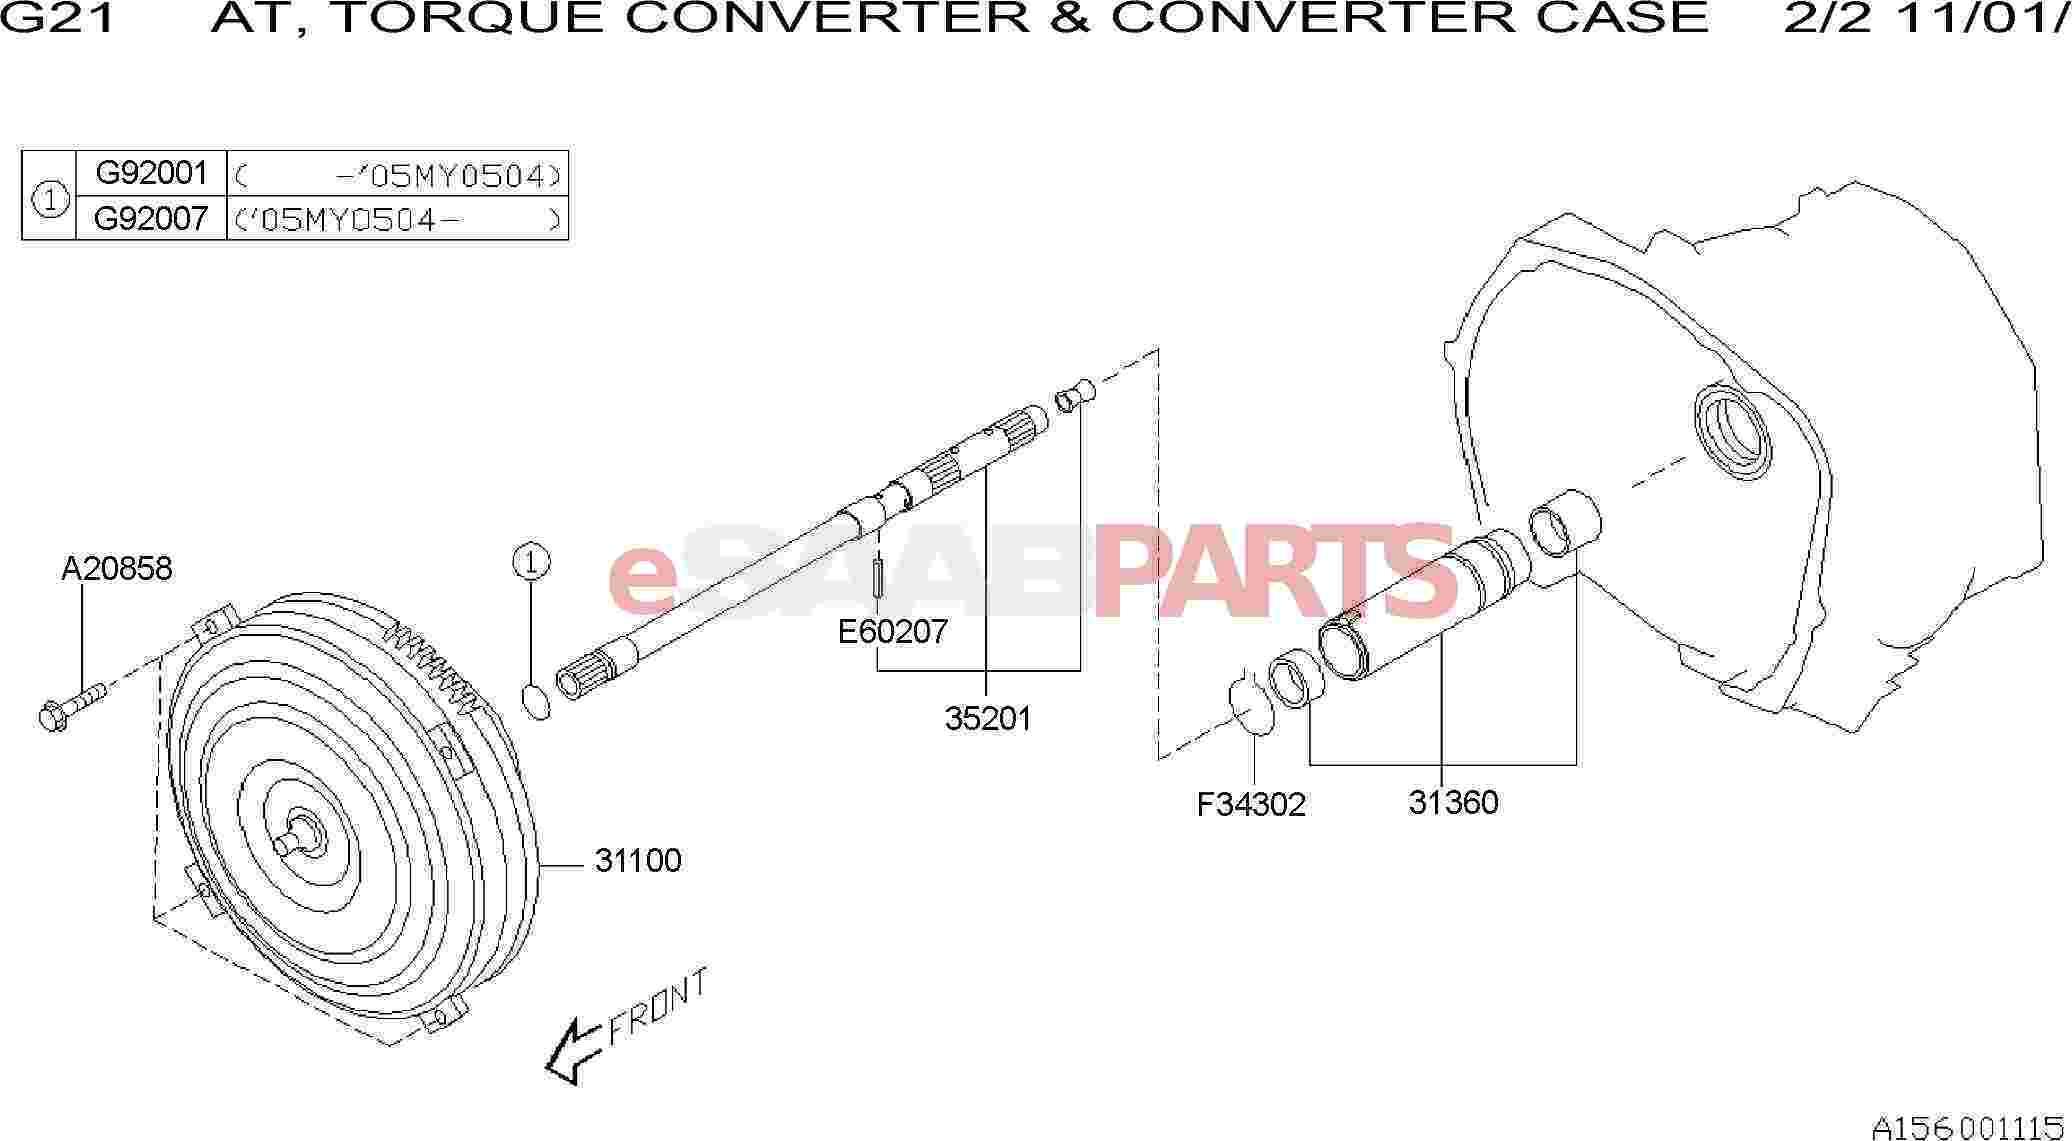 Saab Converter Assembly Torque